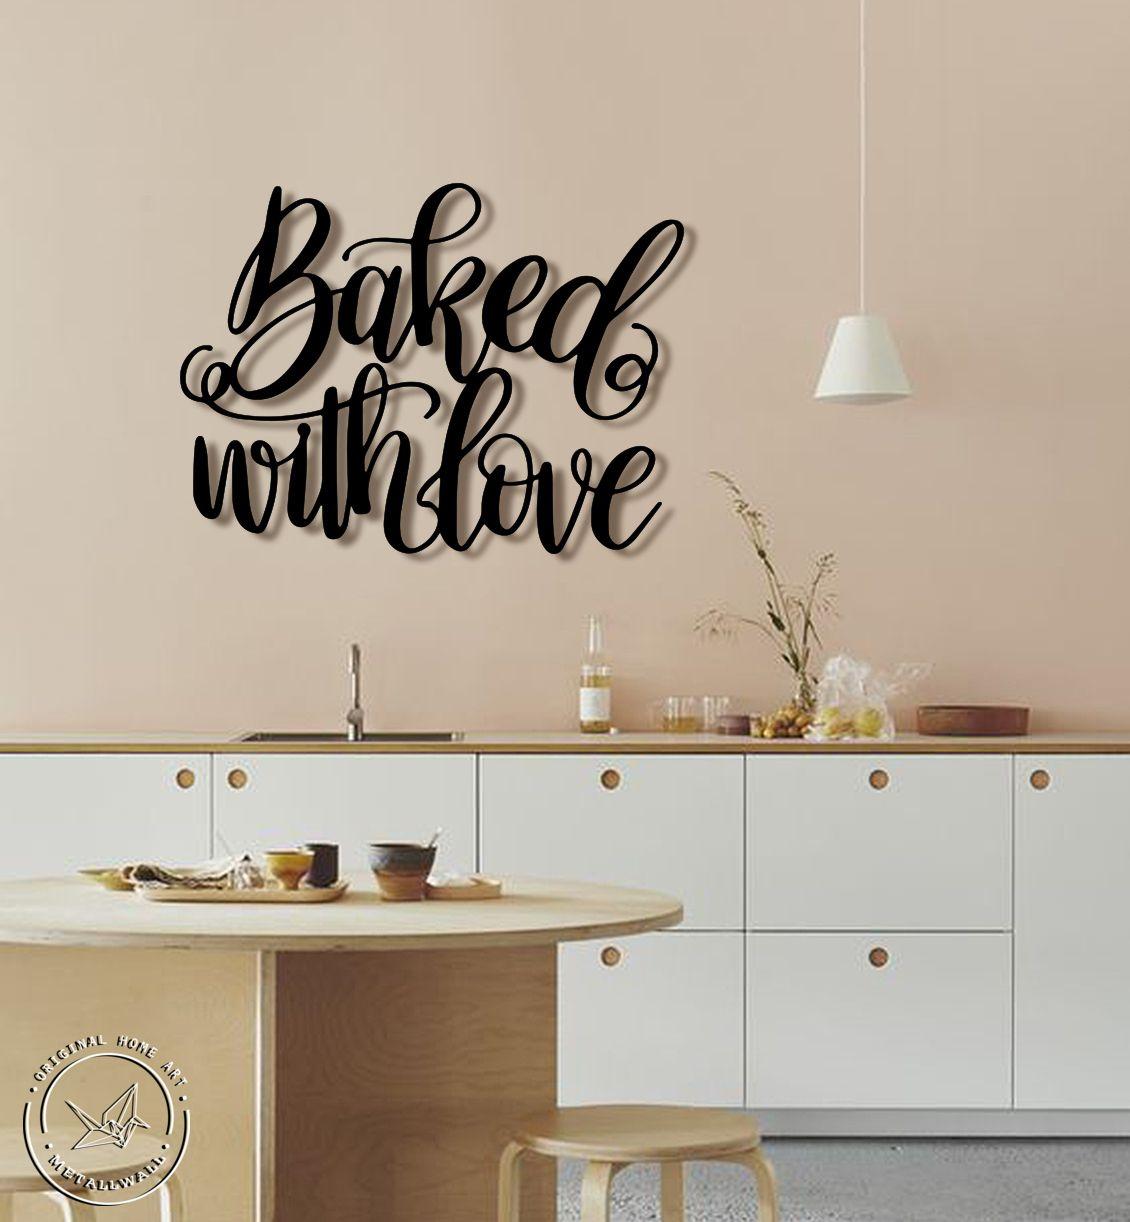 Kitchen wall art ideas, dining wall sign, metal wall art, wall